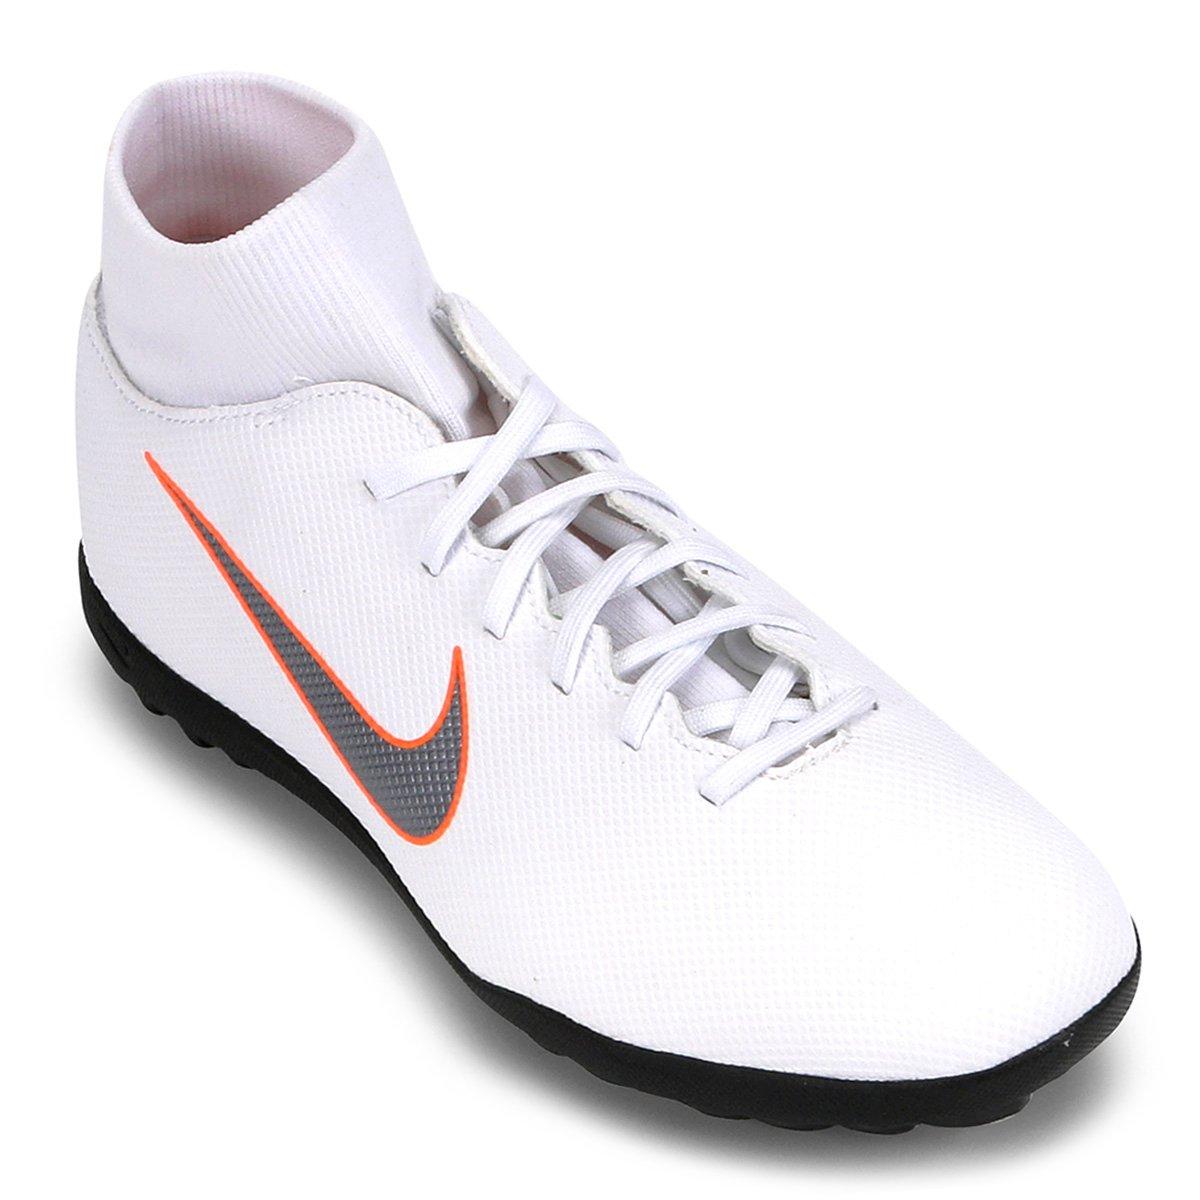 9ca935e0d6387 Chuteira Society Nike Mercurial Superfly 6 Club - Branco e Cinza - Compre  Agora